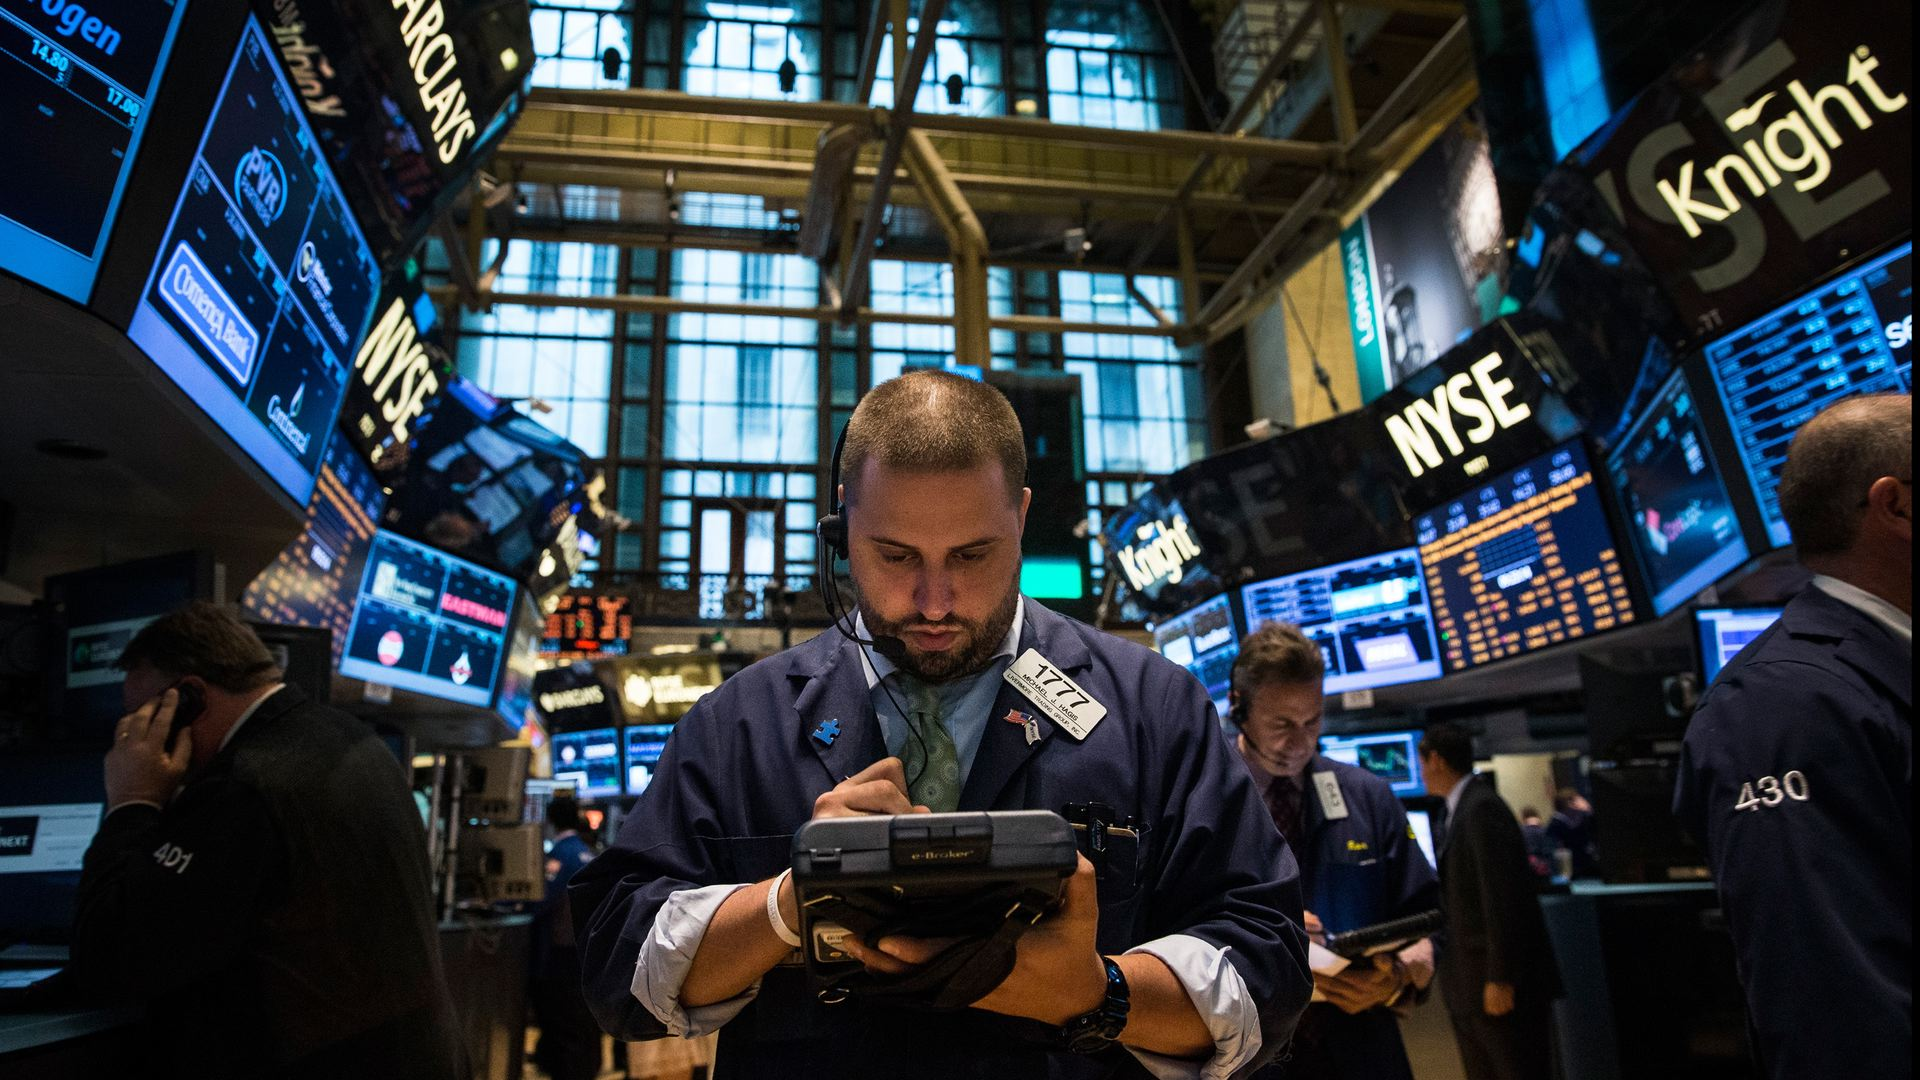 Broker agents monitoring stocks screens